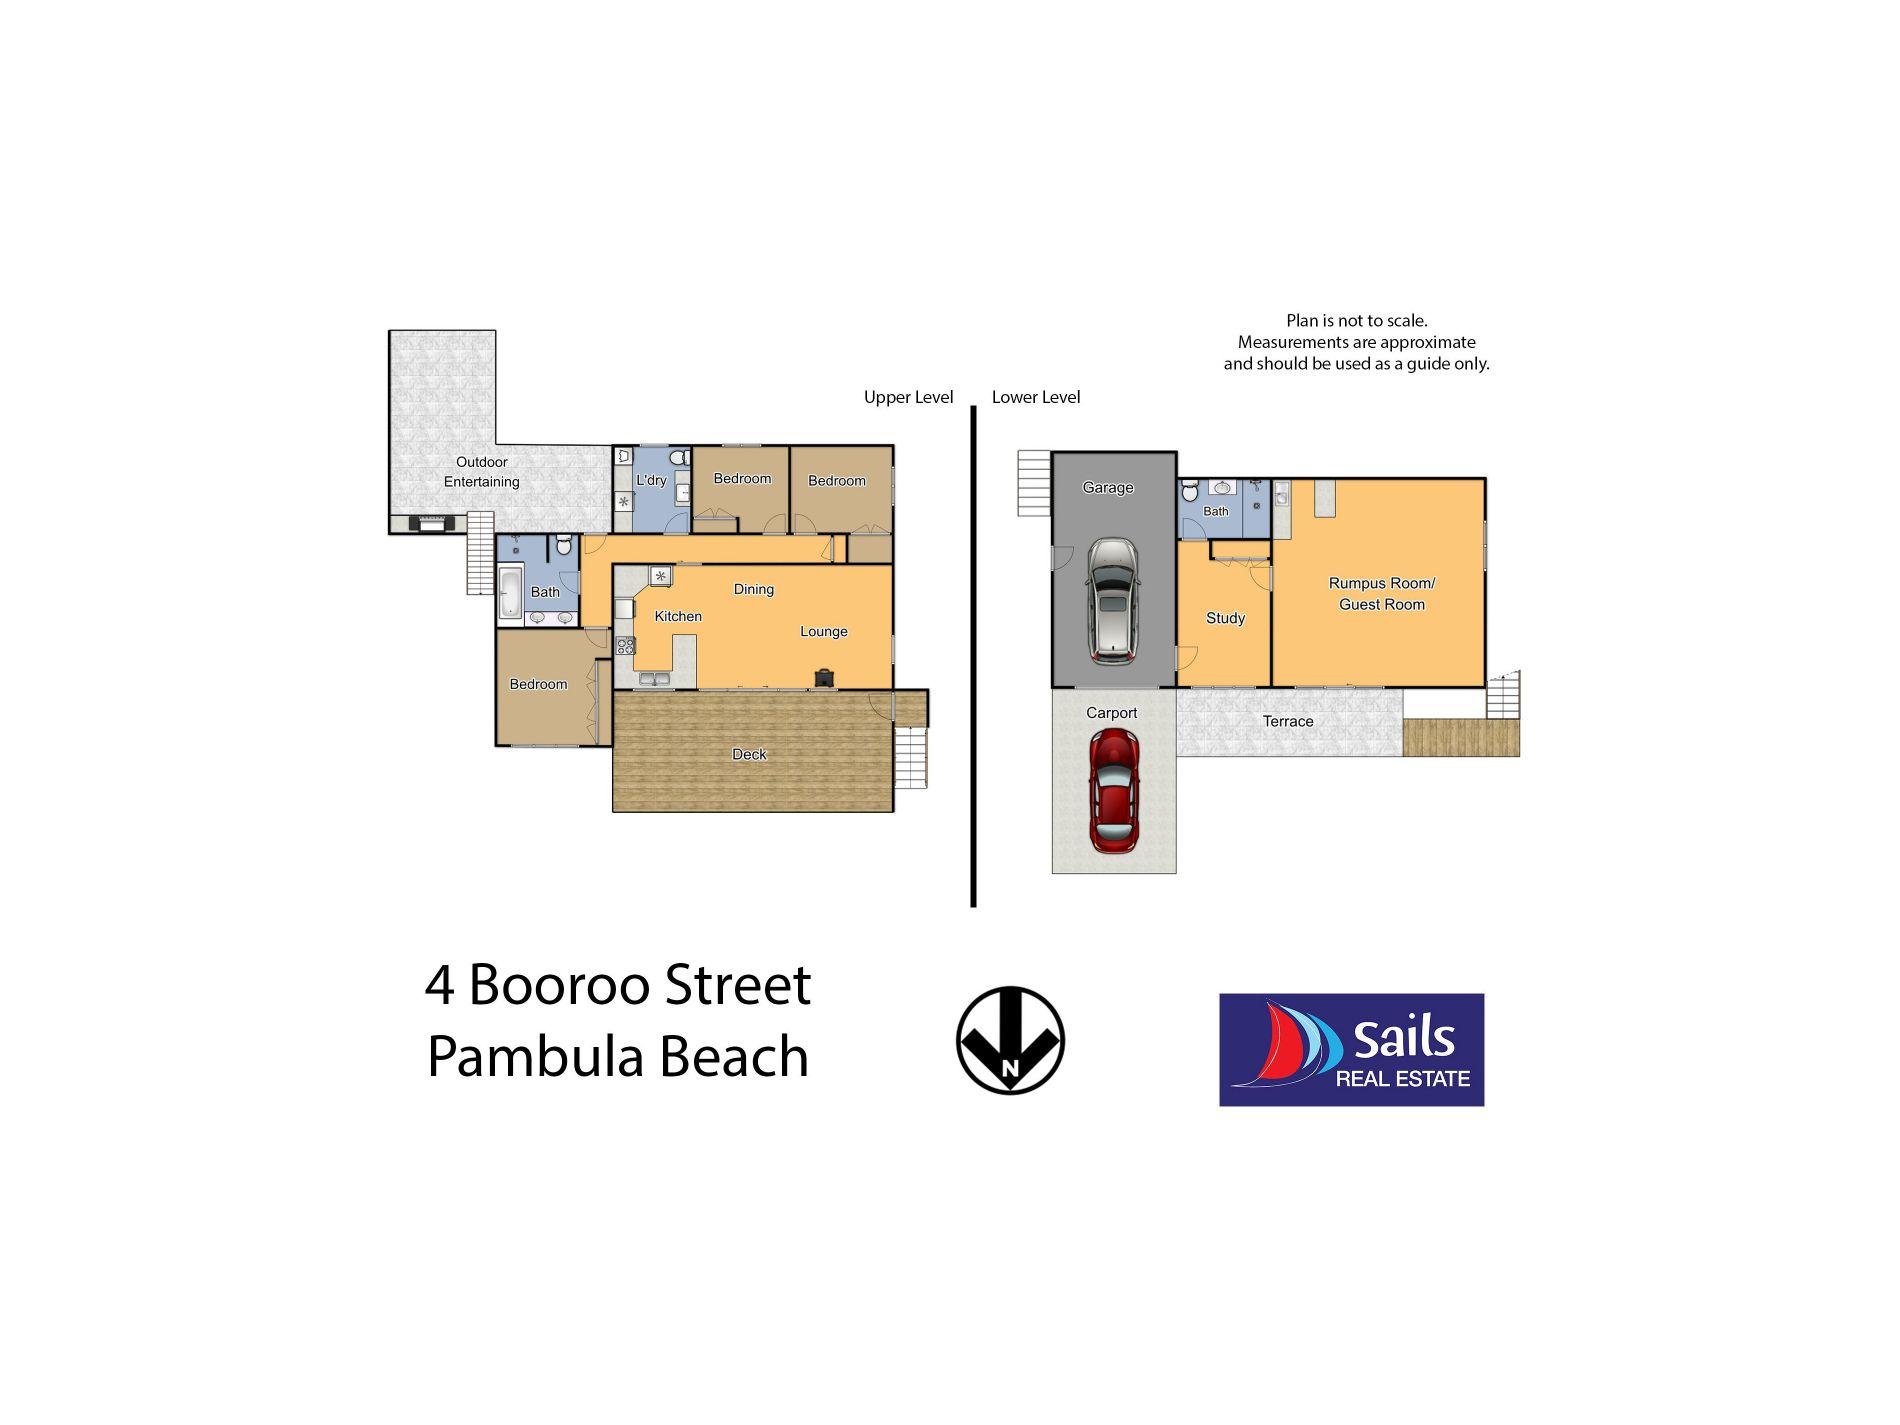 4 Booroo Street, Pambula Beach